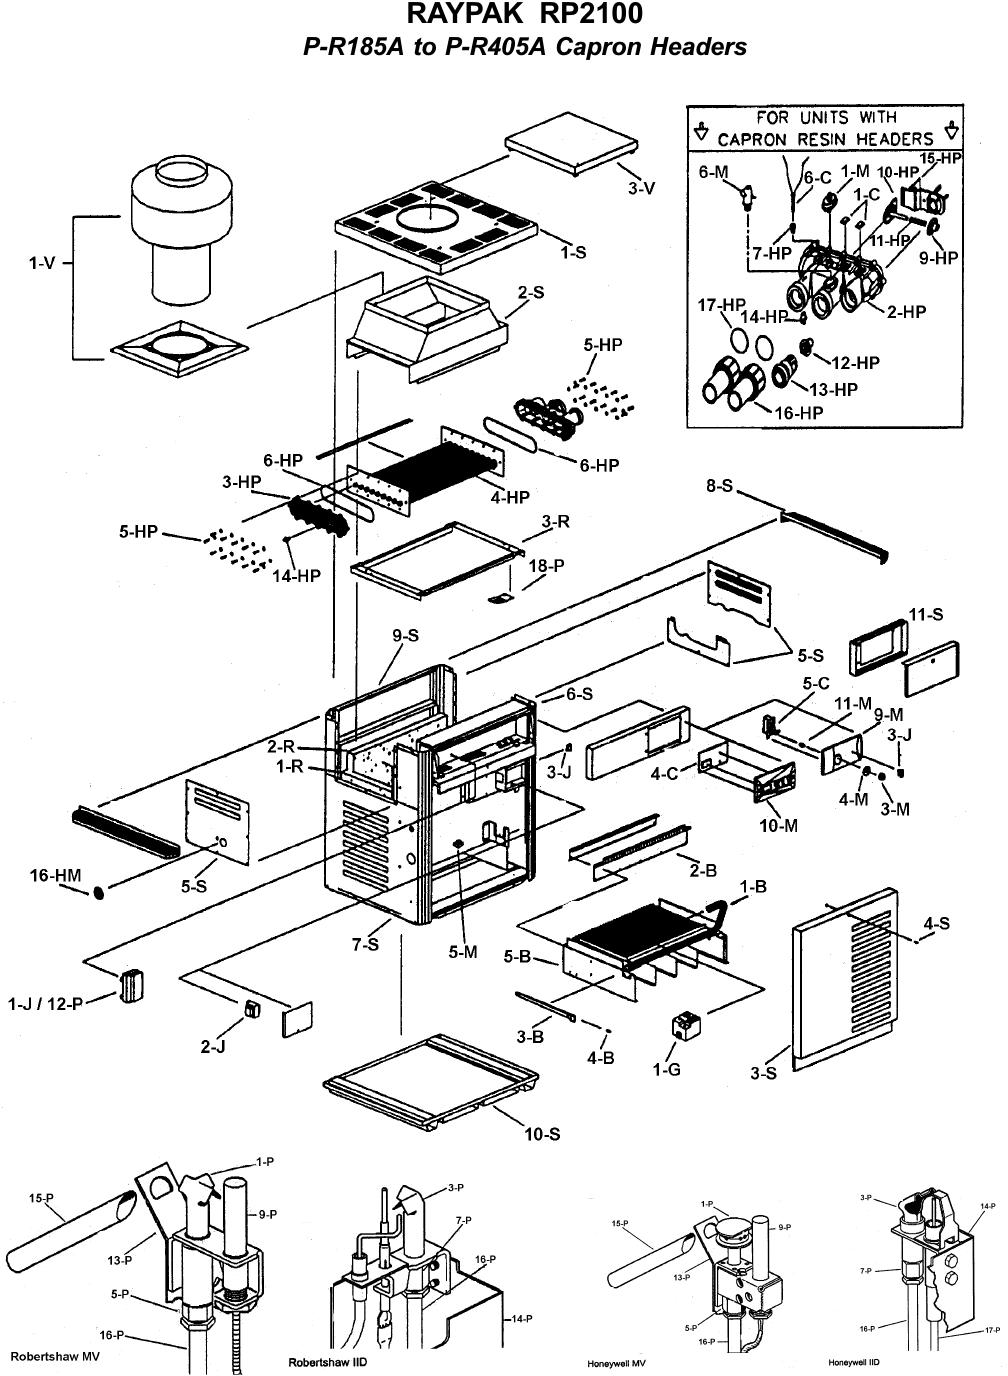 RAYPAK P-R406A-EN-C DIGITAL HEATER NATURAL GAS